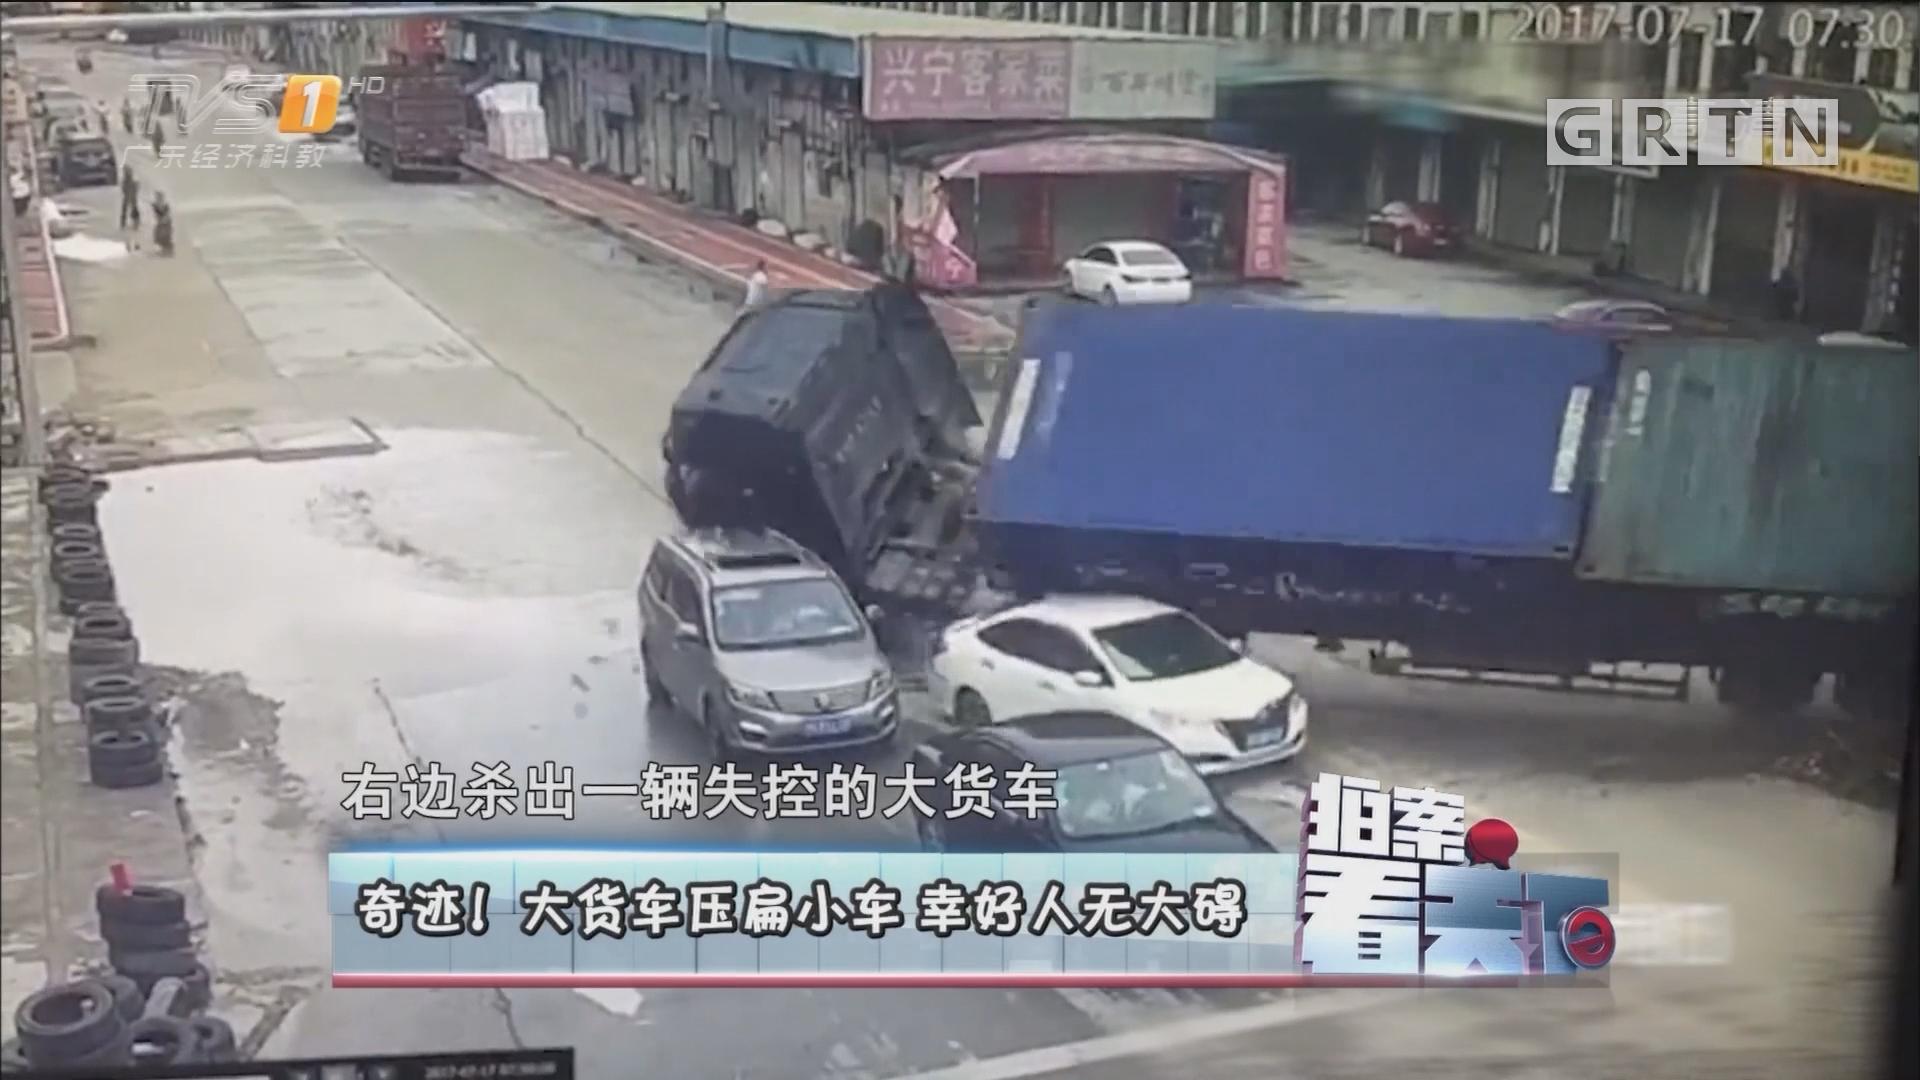 [HD][2017-07-20]拍案看天下:奇迹!大货车压扁小车 幸好人无大碍